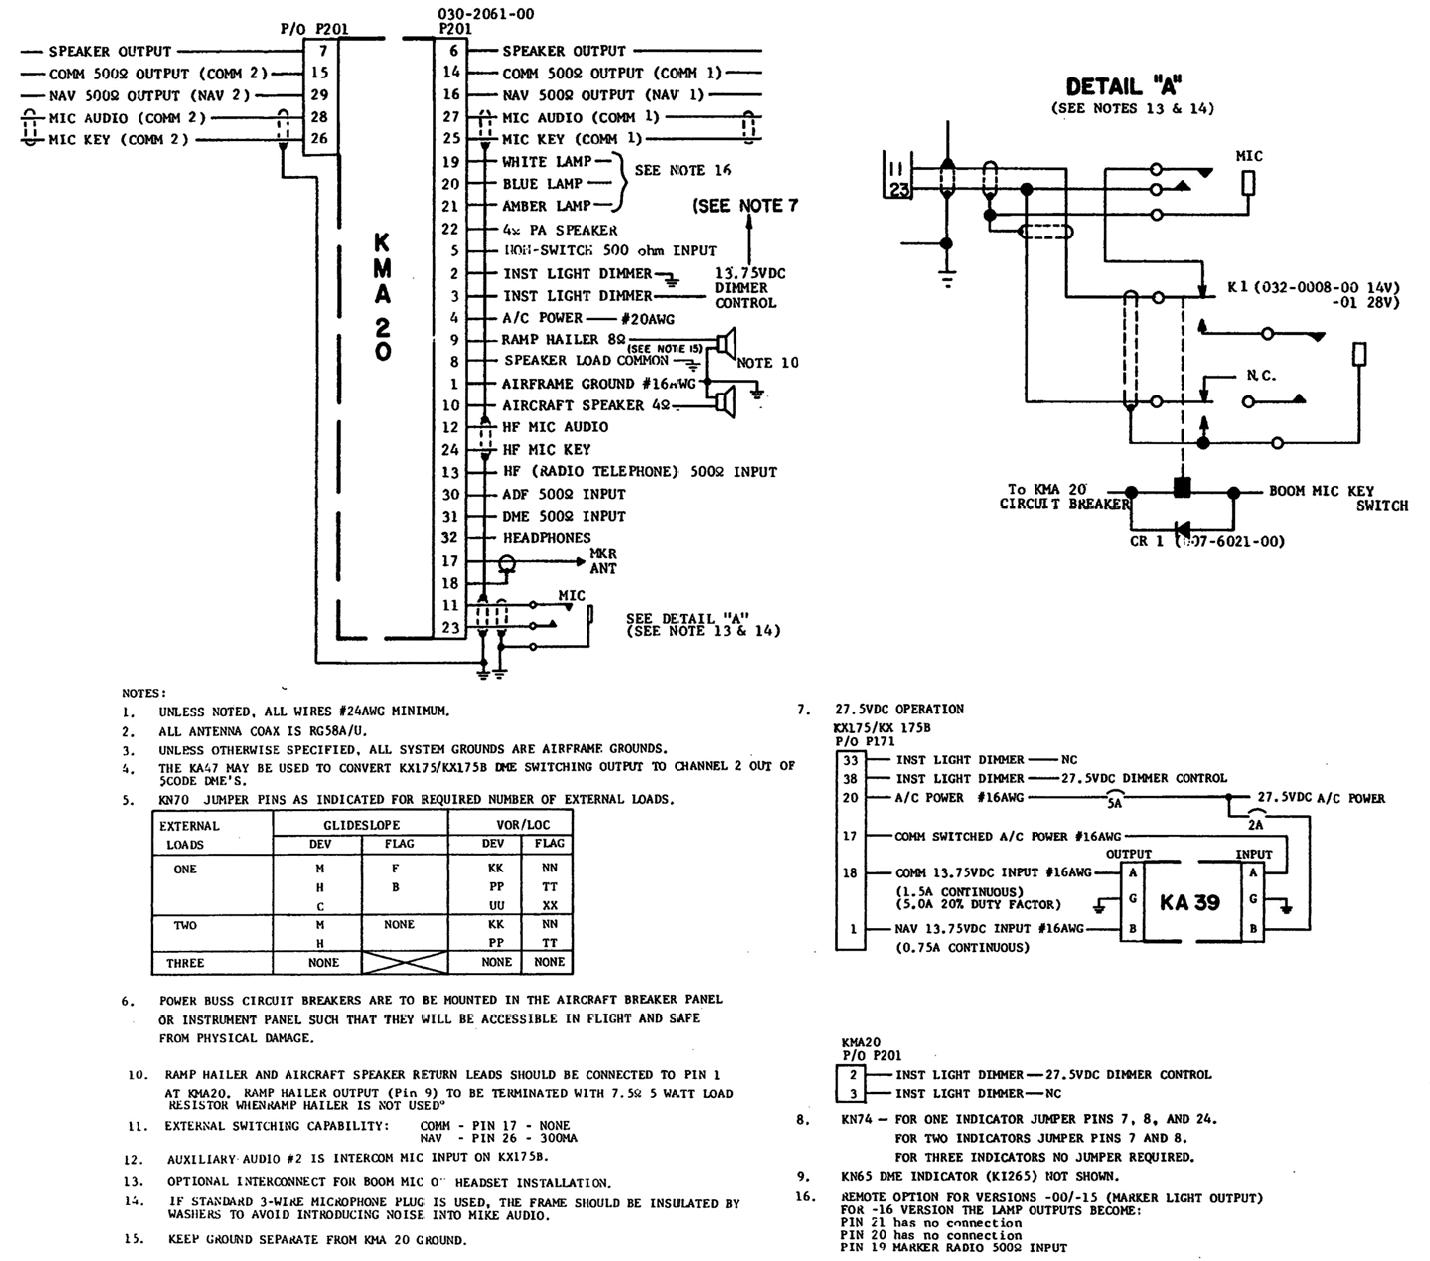 garmin 696 wiring diagram generator 220 plug wiring diagram NMEA 0183 Wiring to Garmin Auto Pilot  Bosch Map Sensor Wiring Diagram 4 Wire Mini Cooper Radio Wiring Diagram Wiring Garmin Nuvi Cradle